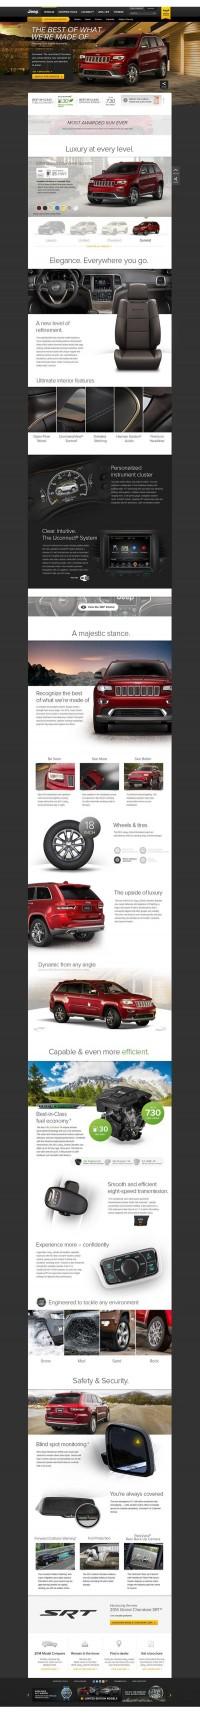 Jeep.com on